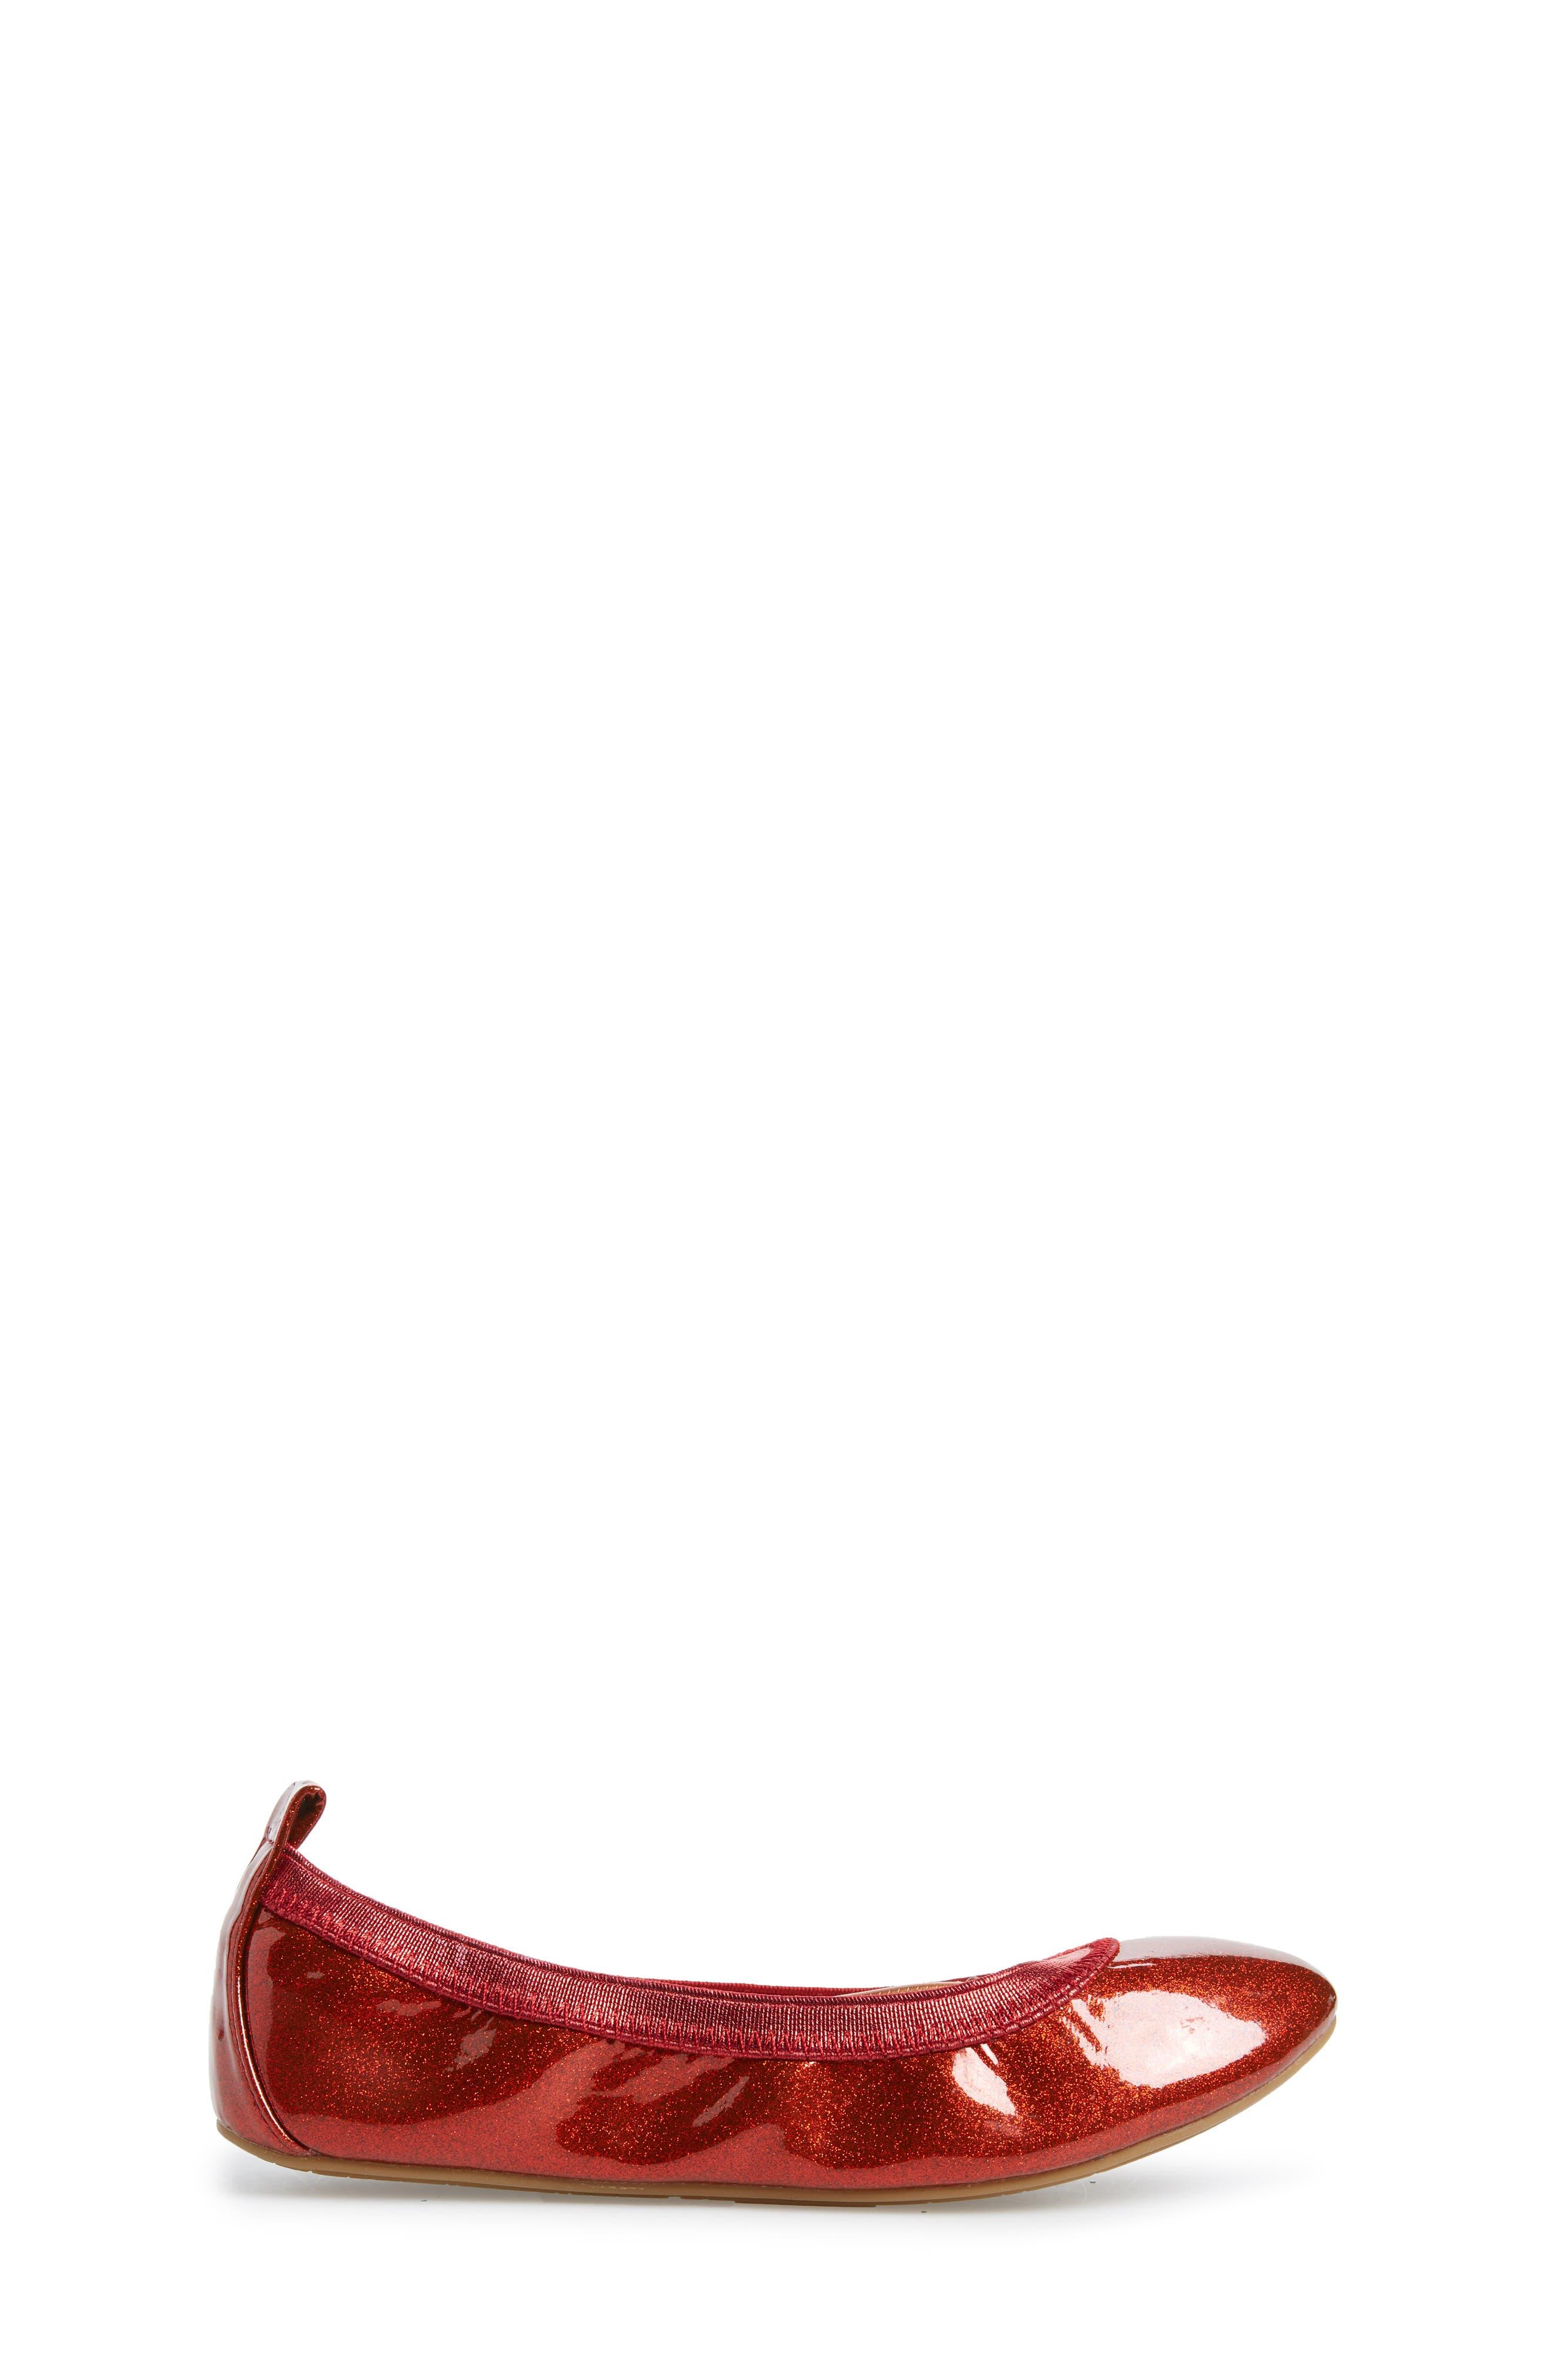 Miss Samara Ballet Flat,                             Alternate thumbnail 3, color,                             RED PATENT GLITTER